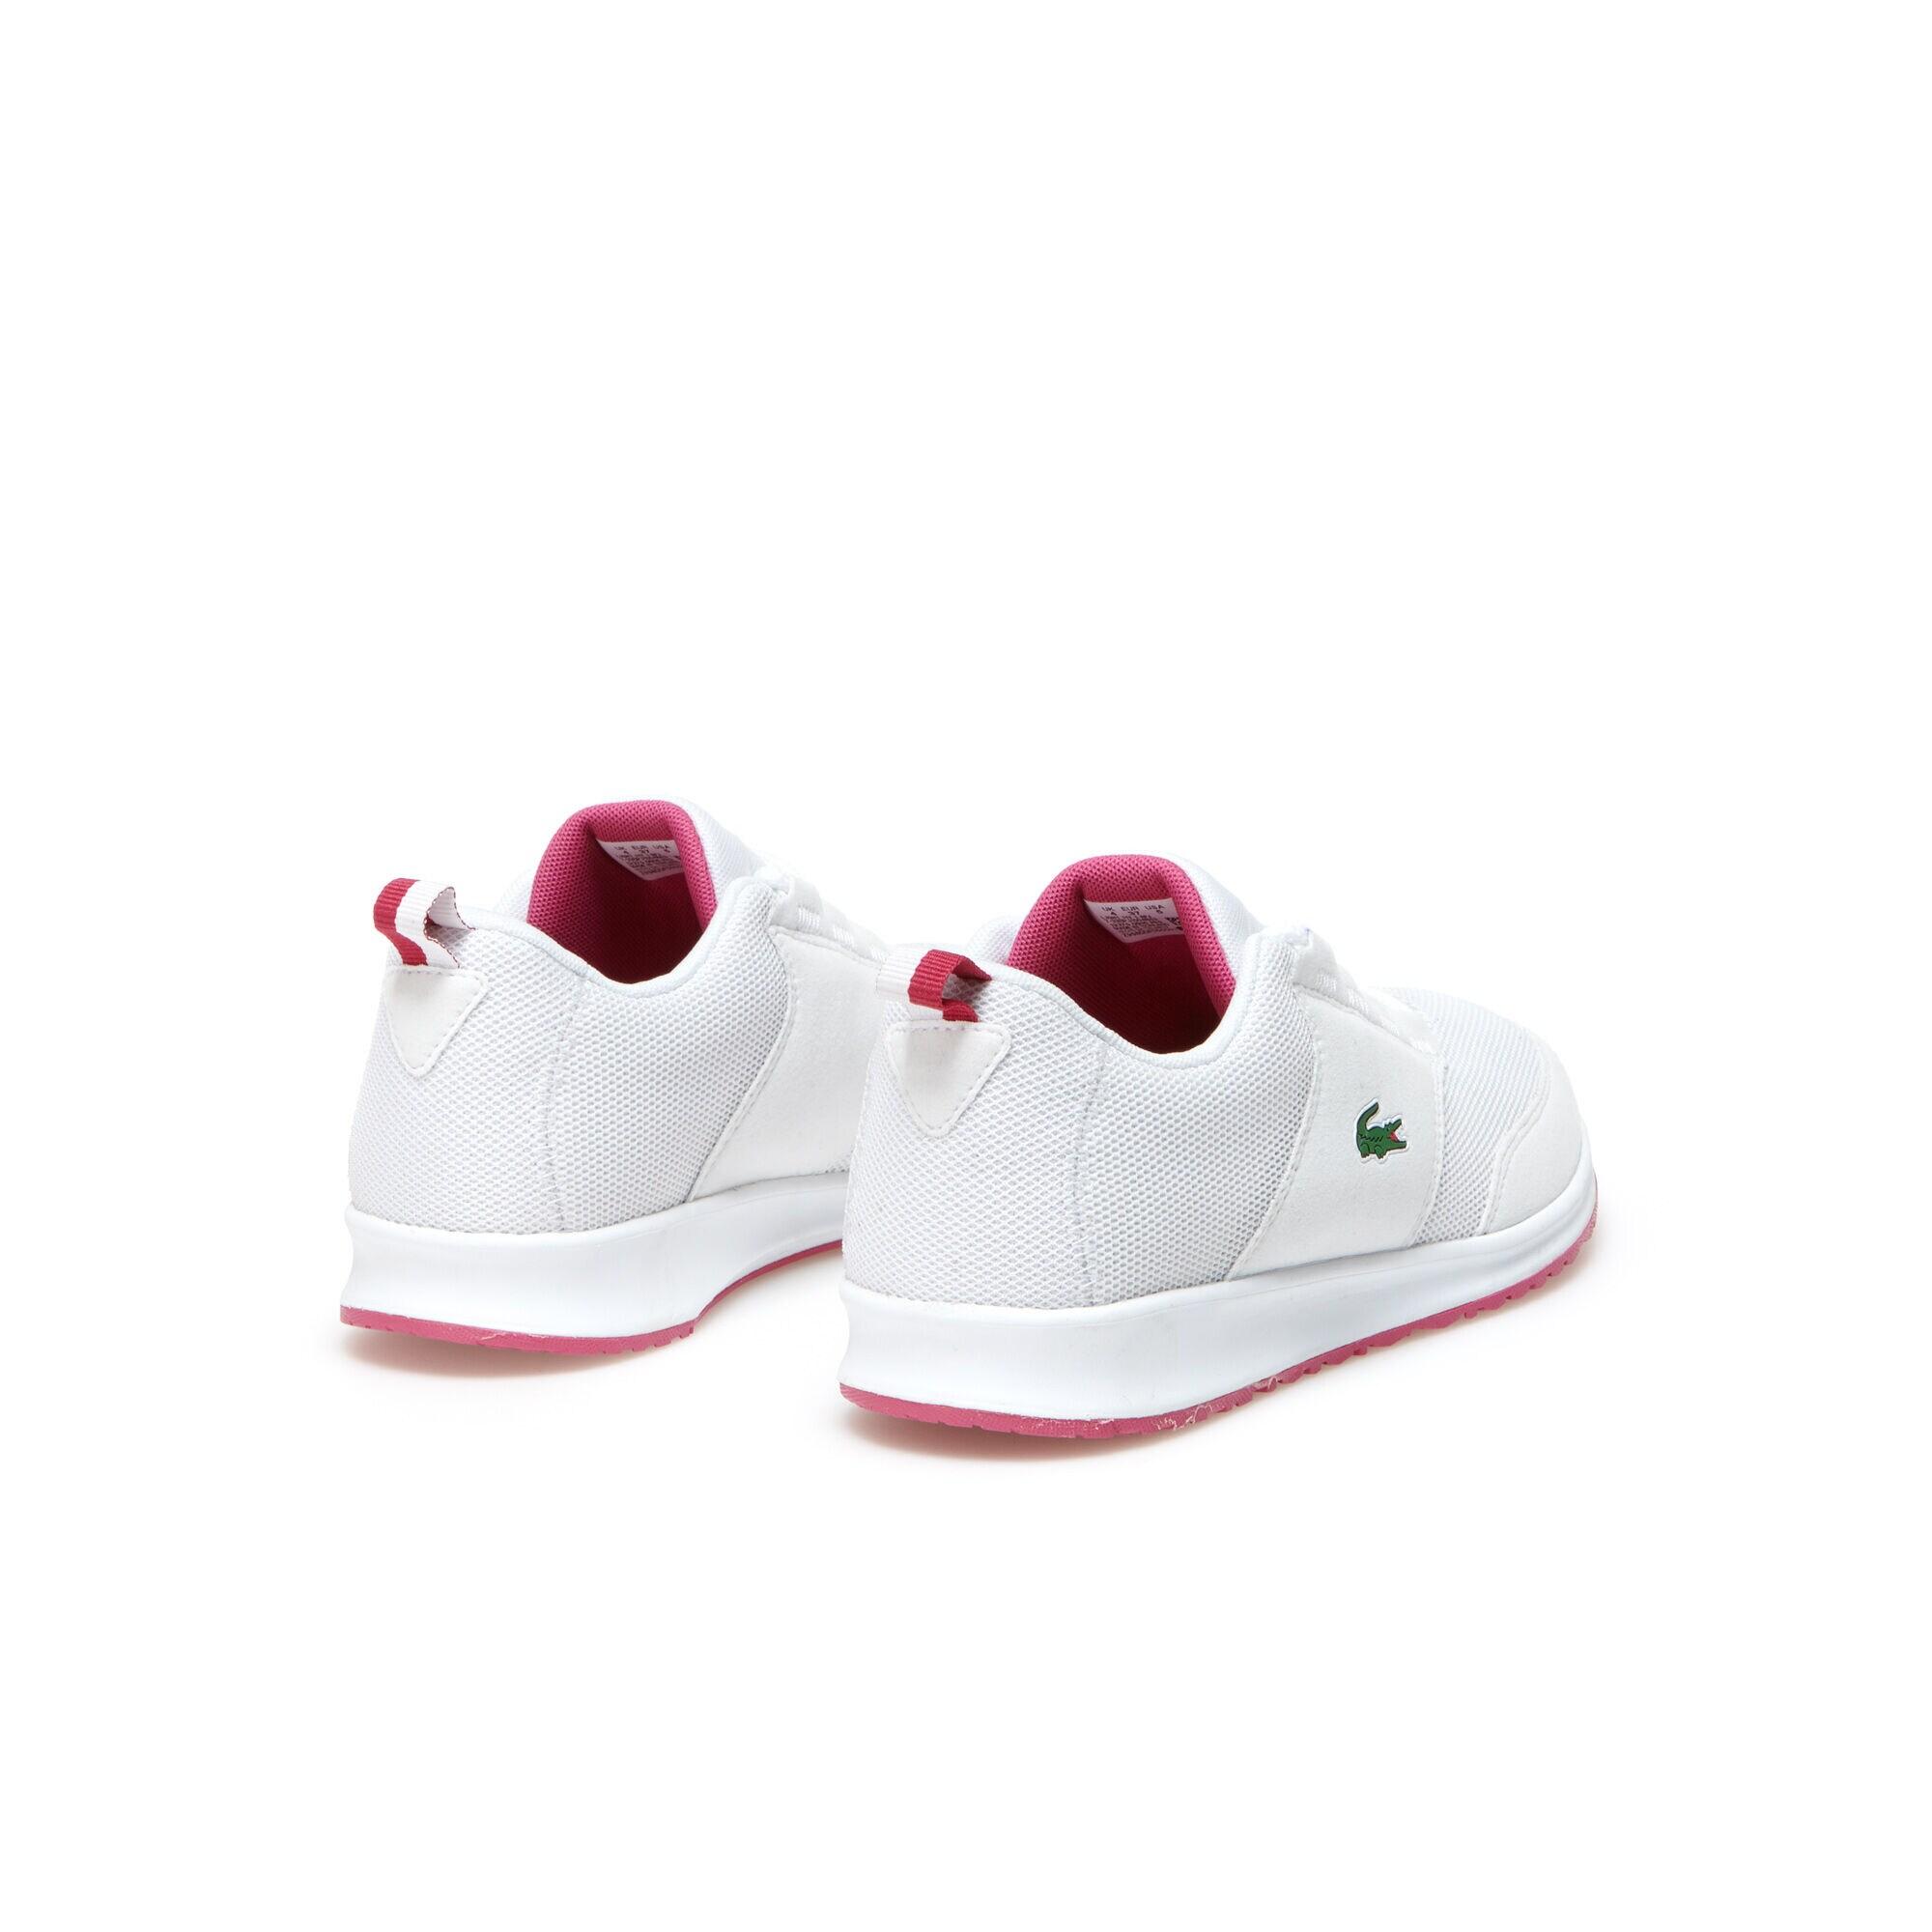 Lacoste кросівки дитячі L.ight